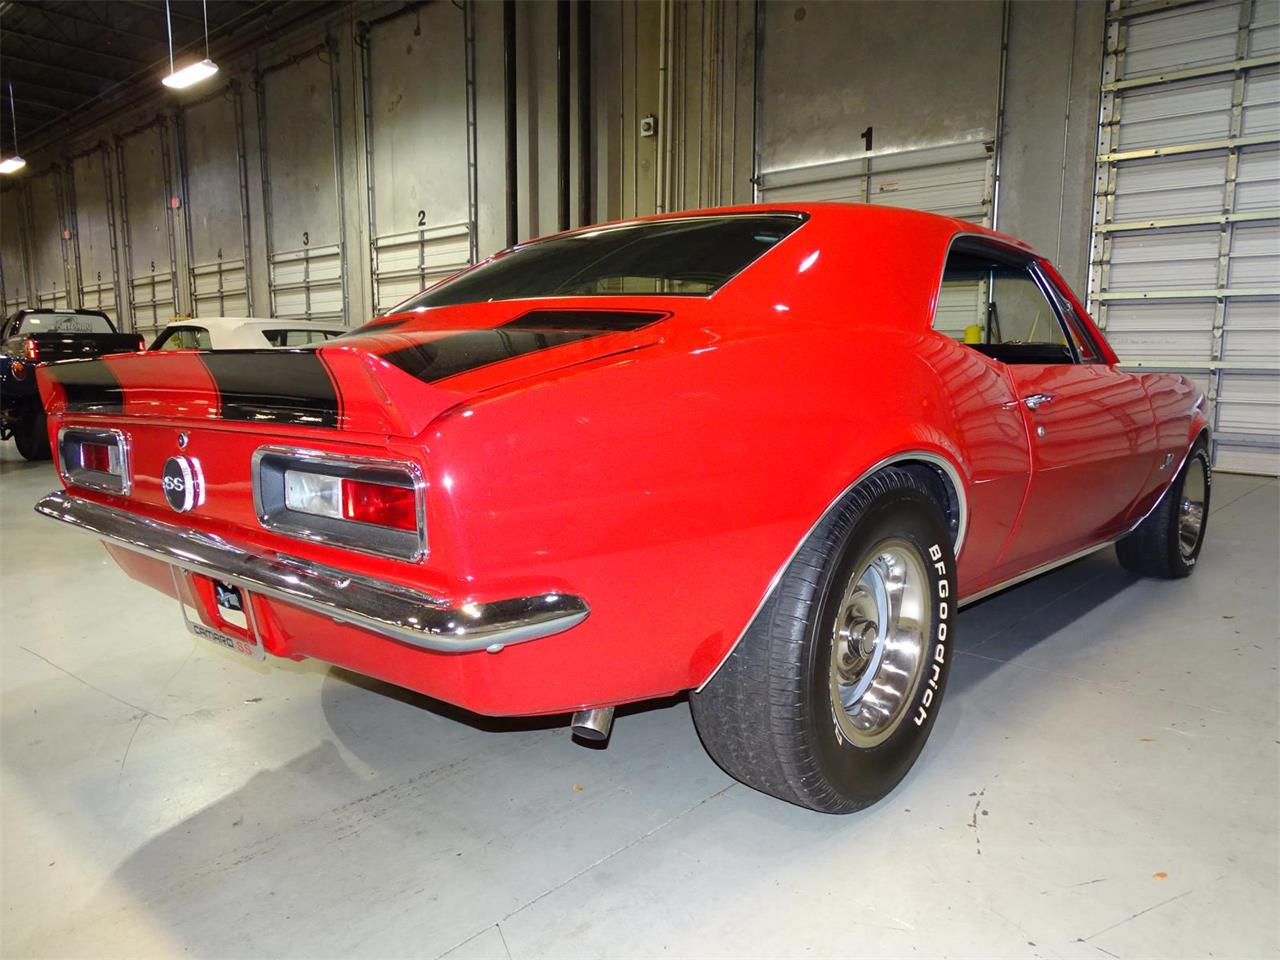 Large Picture of '67 Chevrolet Camaro located in Clayton California - $32,000.00 - PUZ1